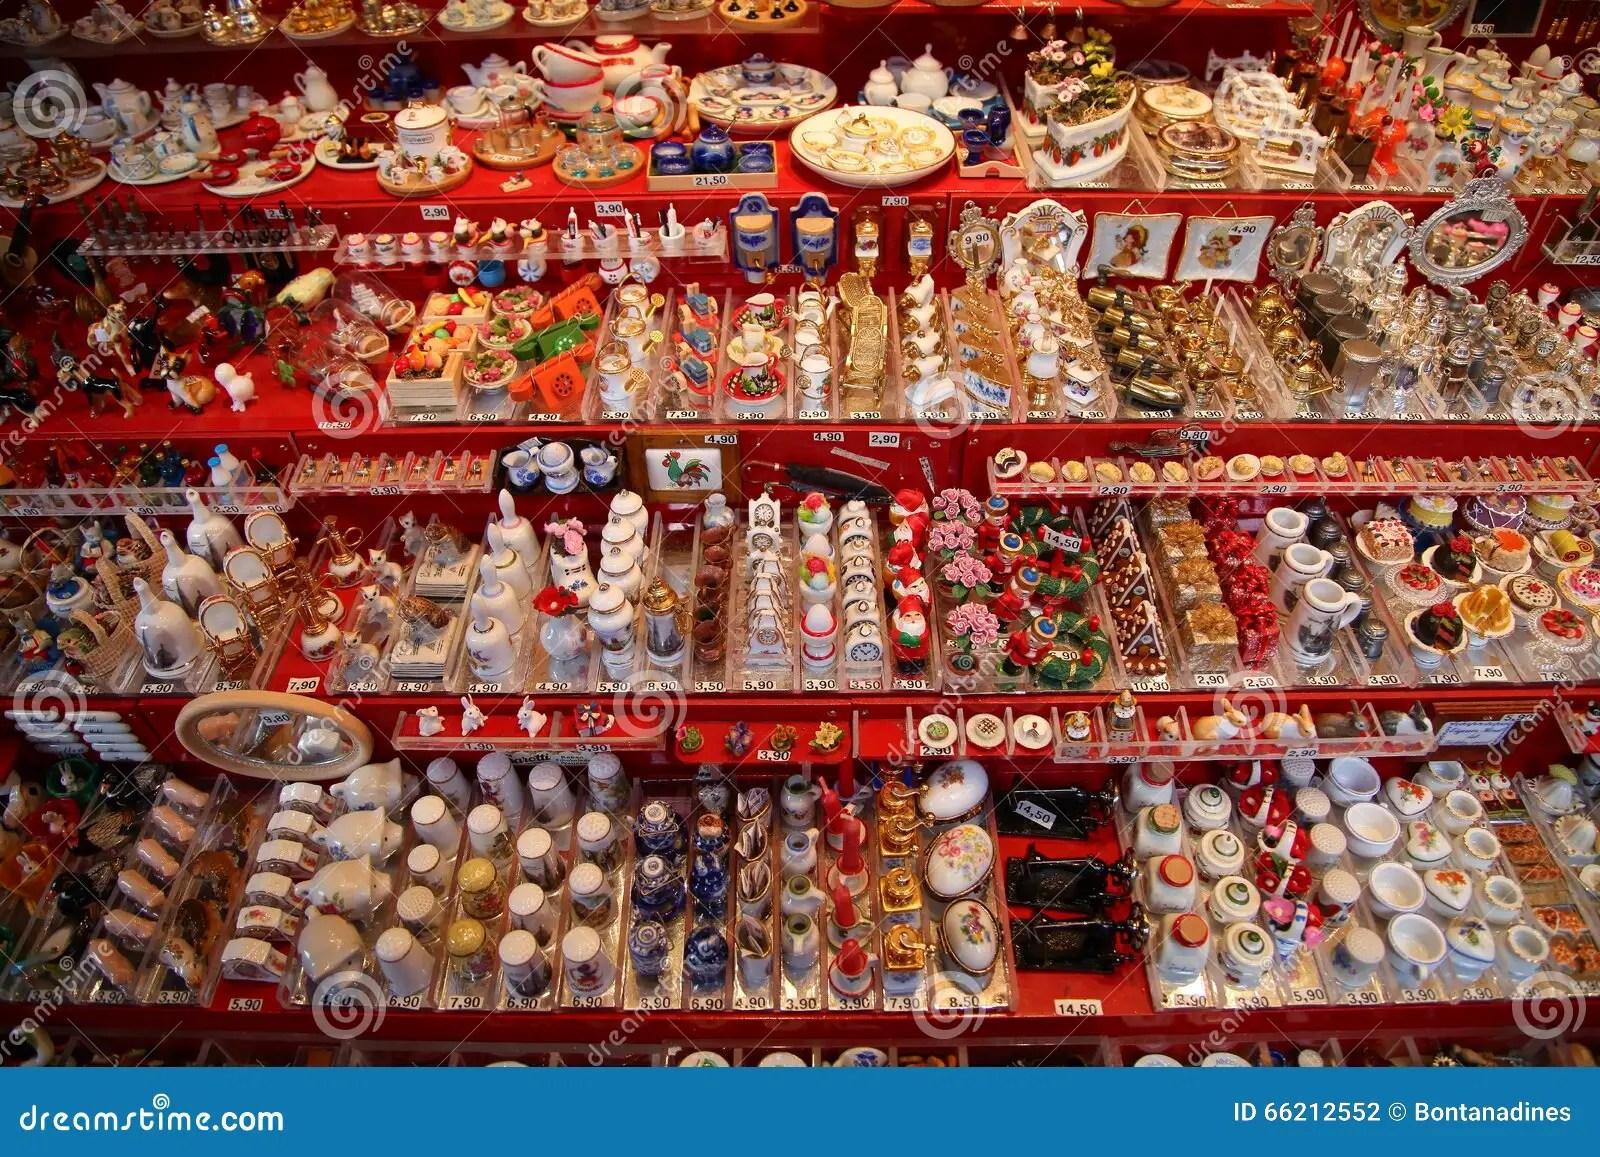 german christmas market plans - Oconomowoc German Christmas Market